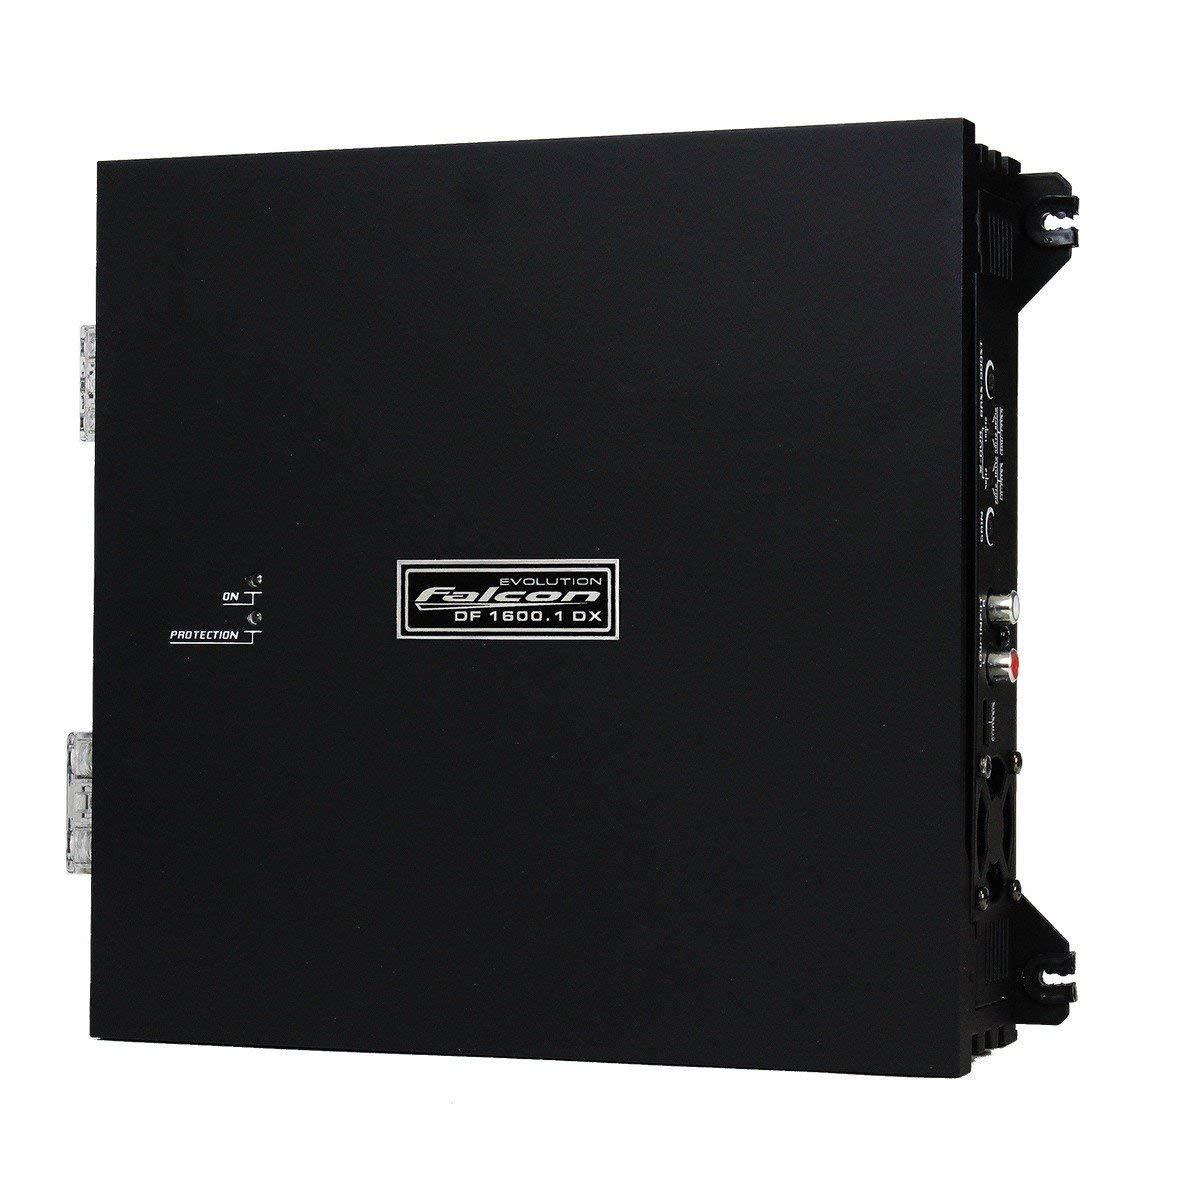 Módulo de Potência Falcon DF1600 - 1x1600WRMS